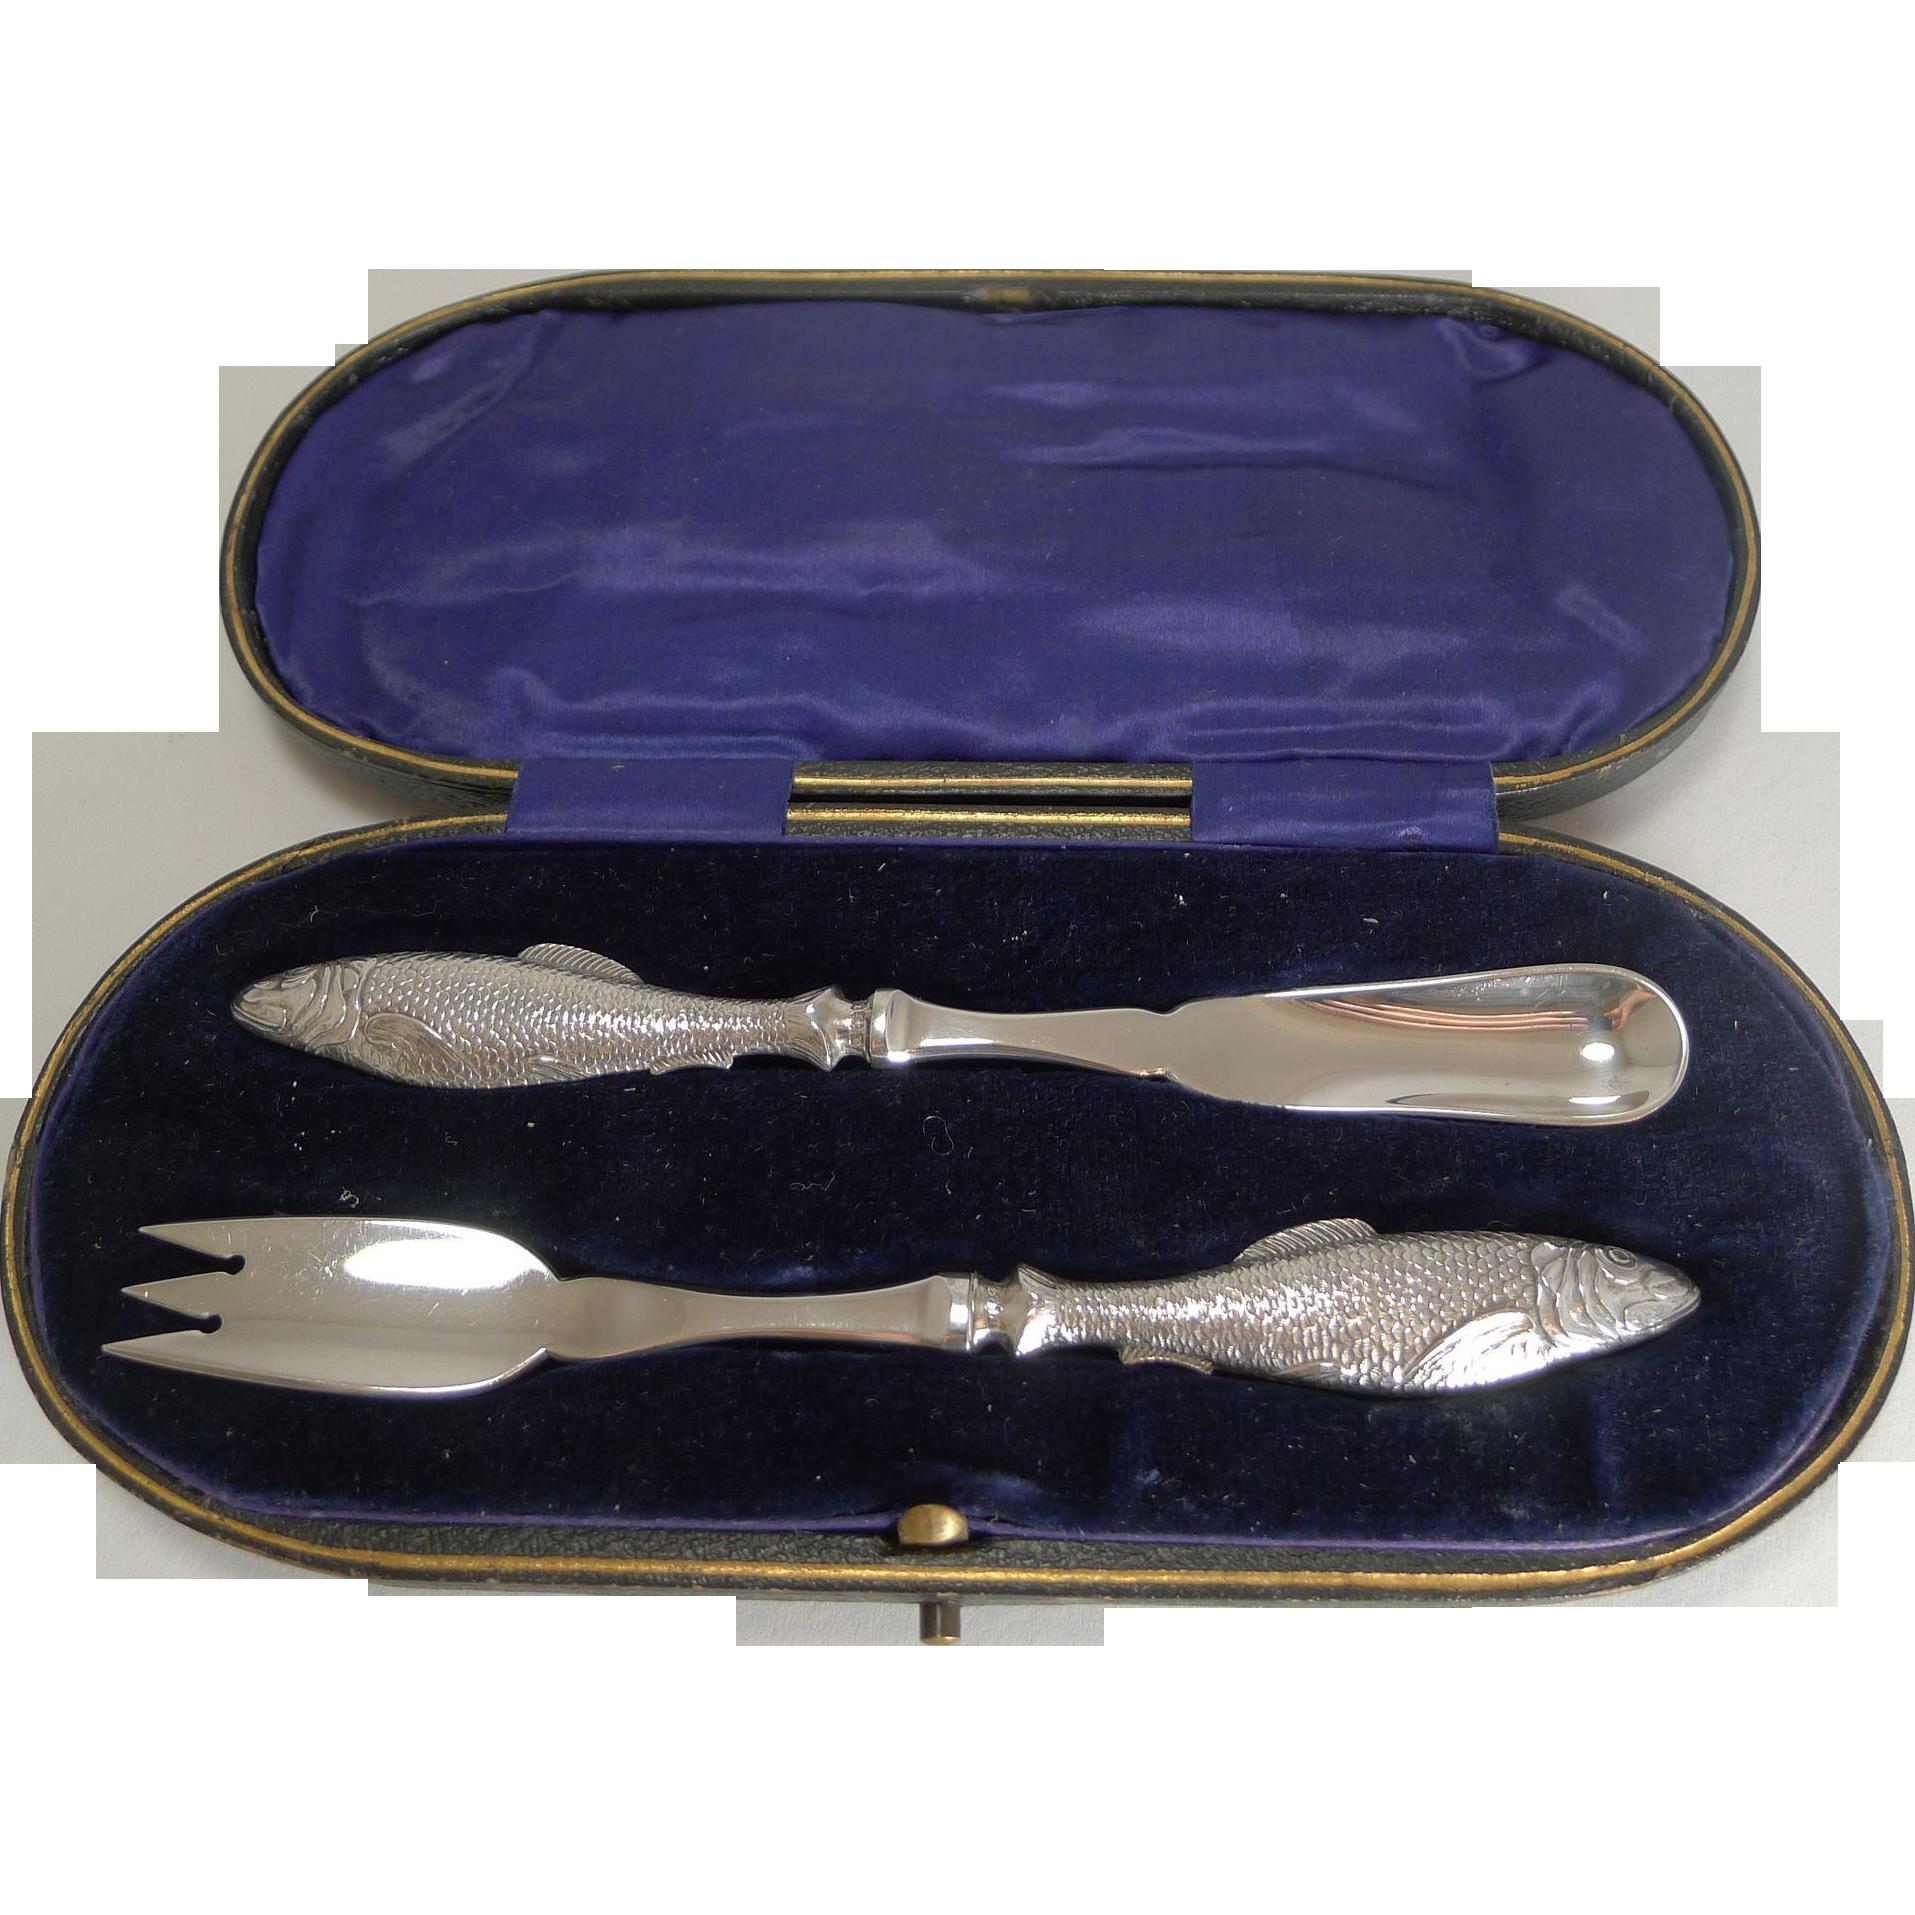 Rare Antique English Sterling Silver Fish Set - Harrods - 1912